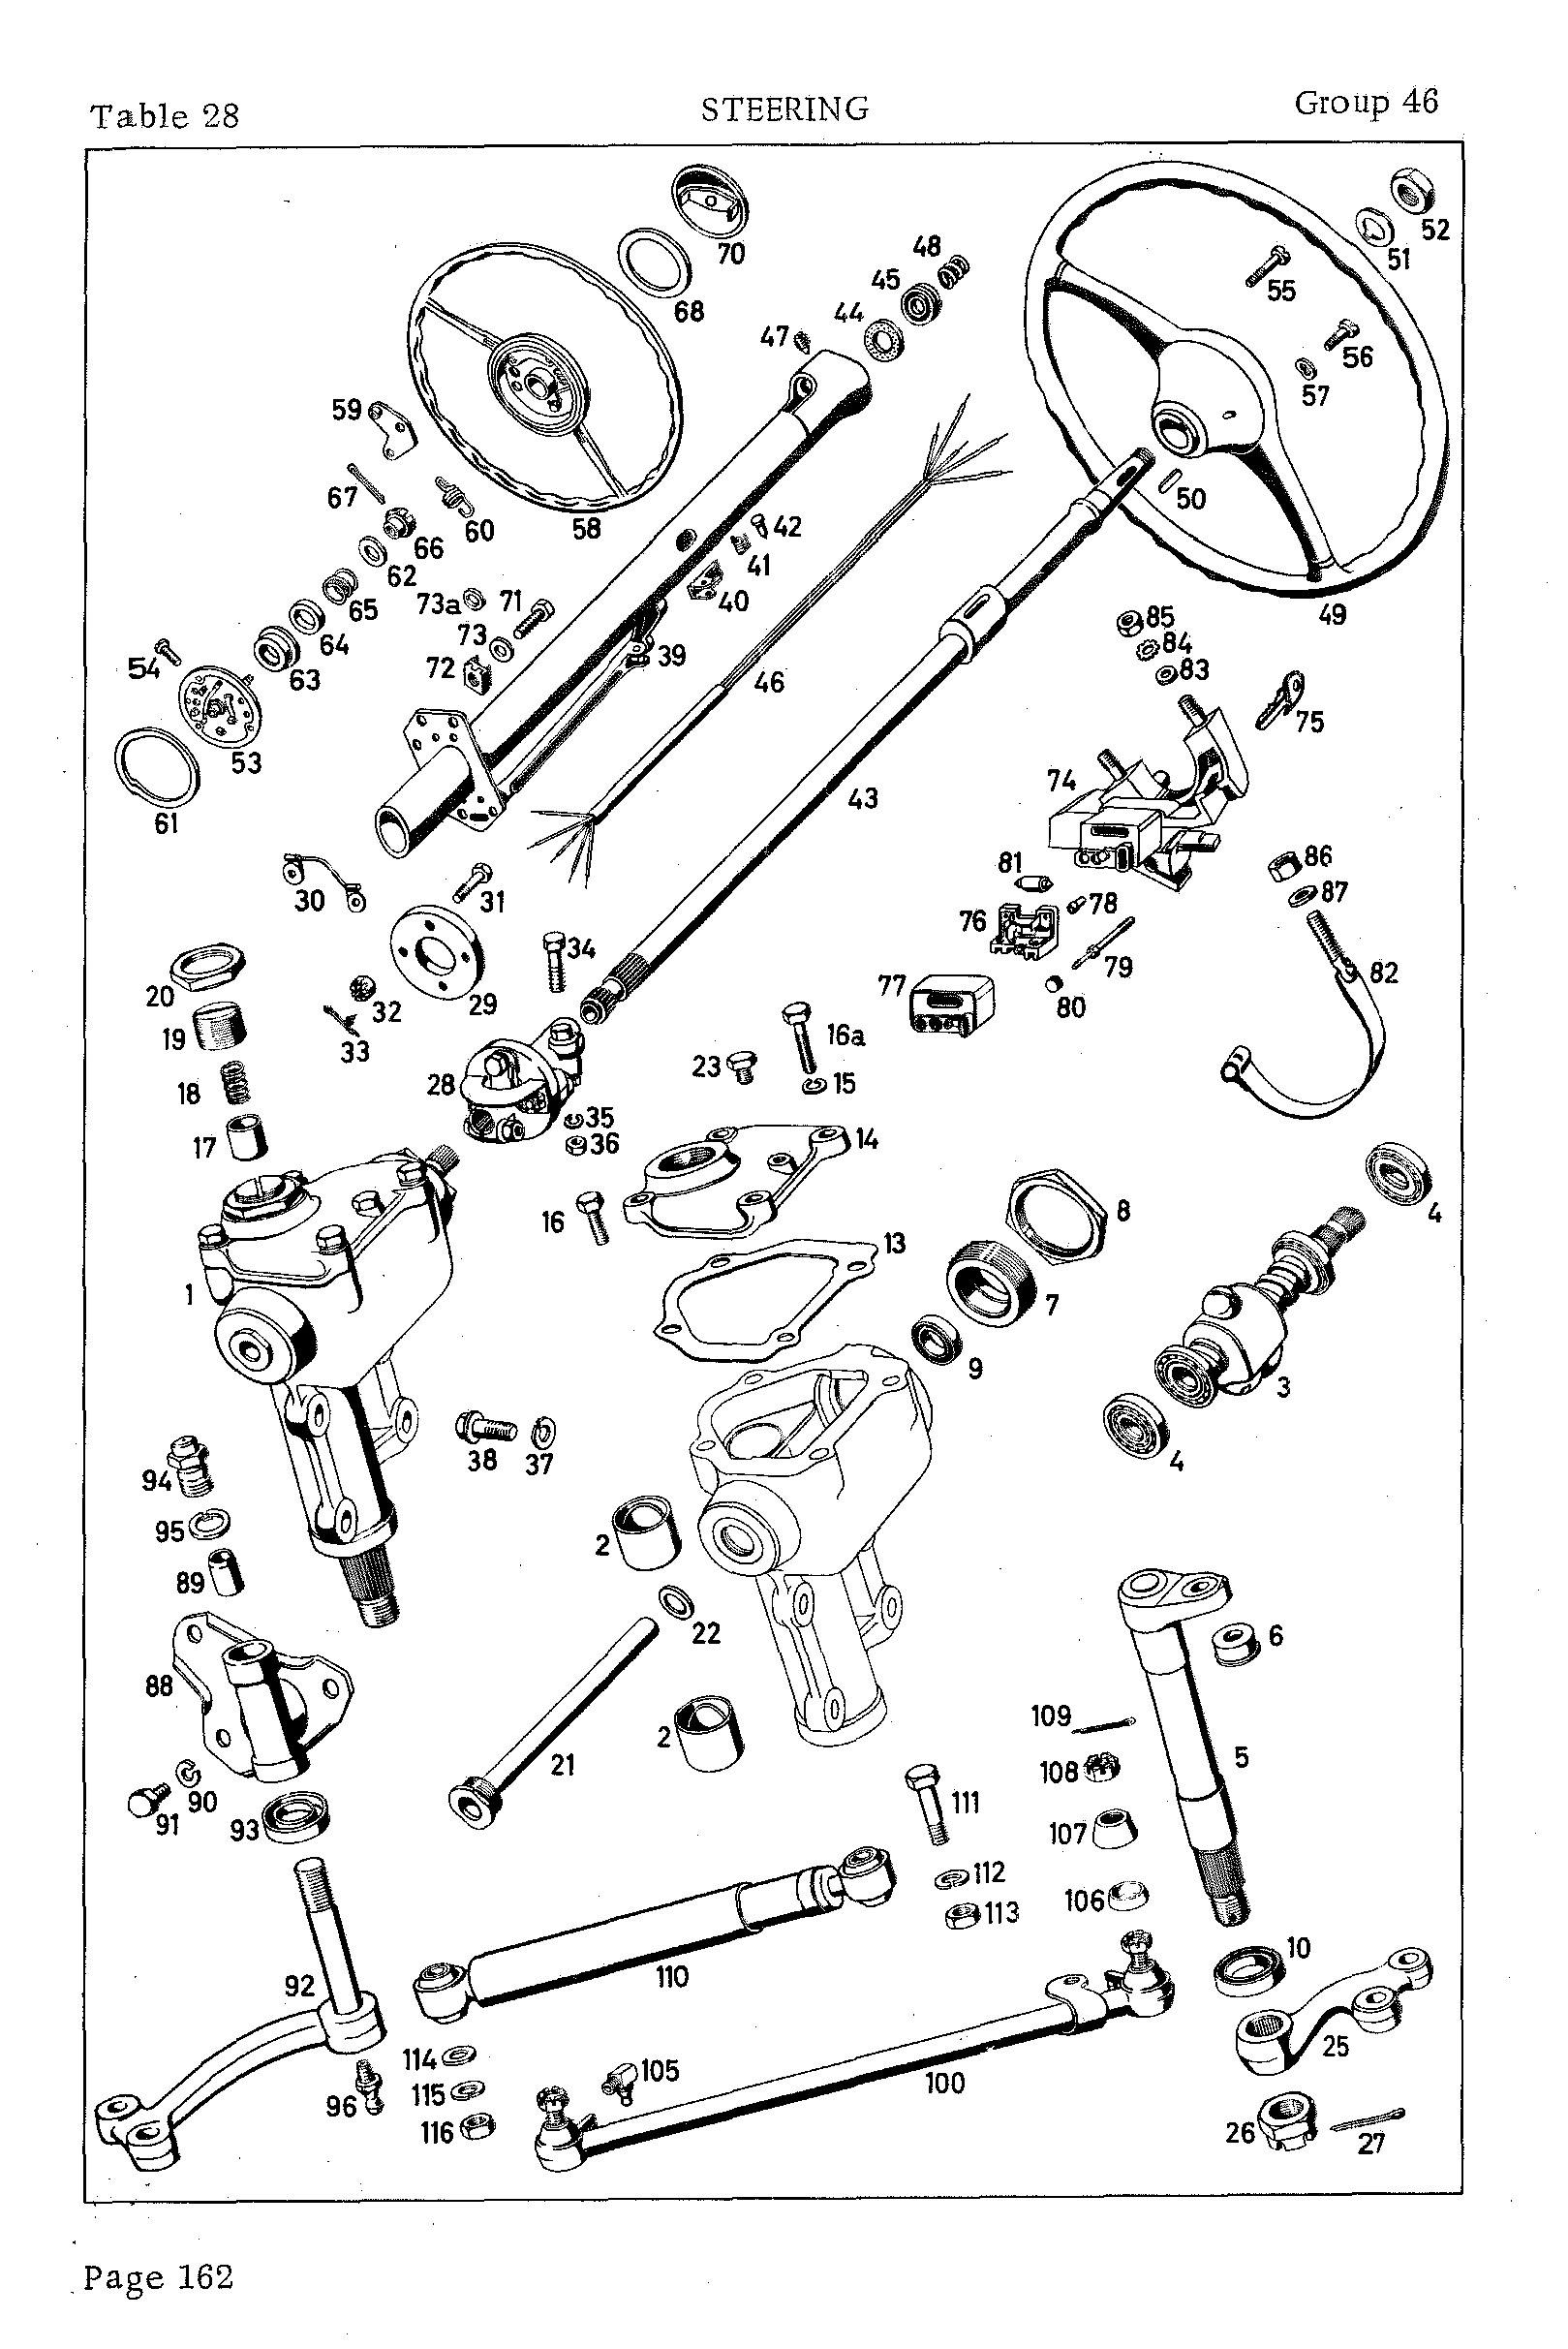 Mercedes-Benz Ponton Ignition Switch Repair © www